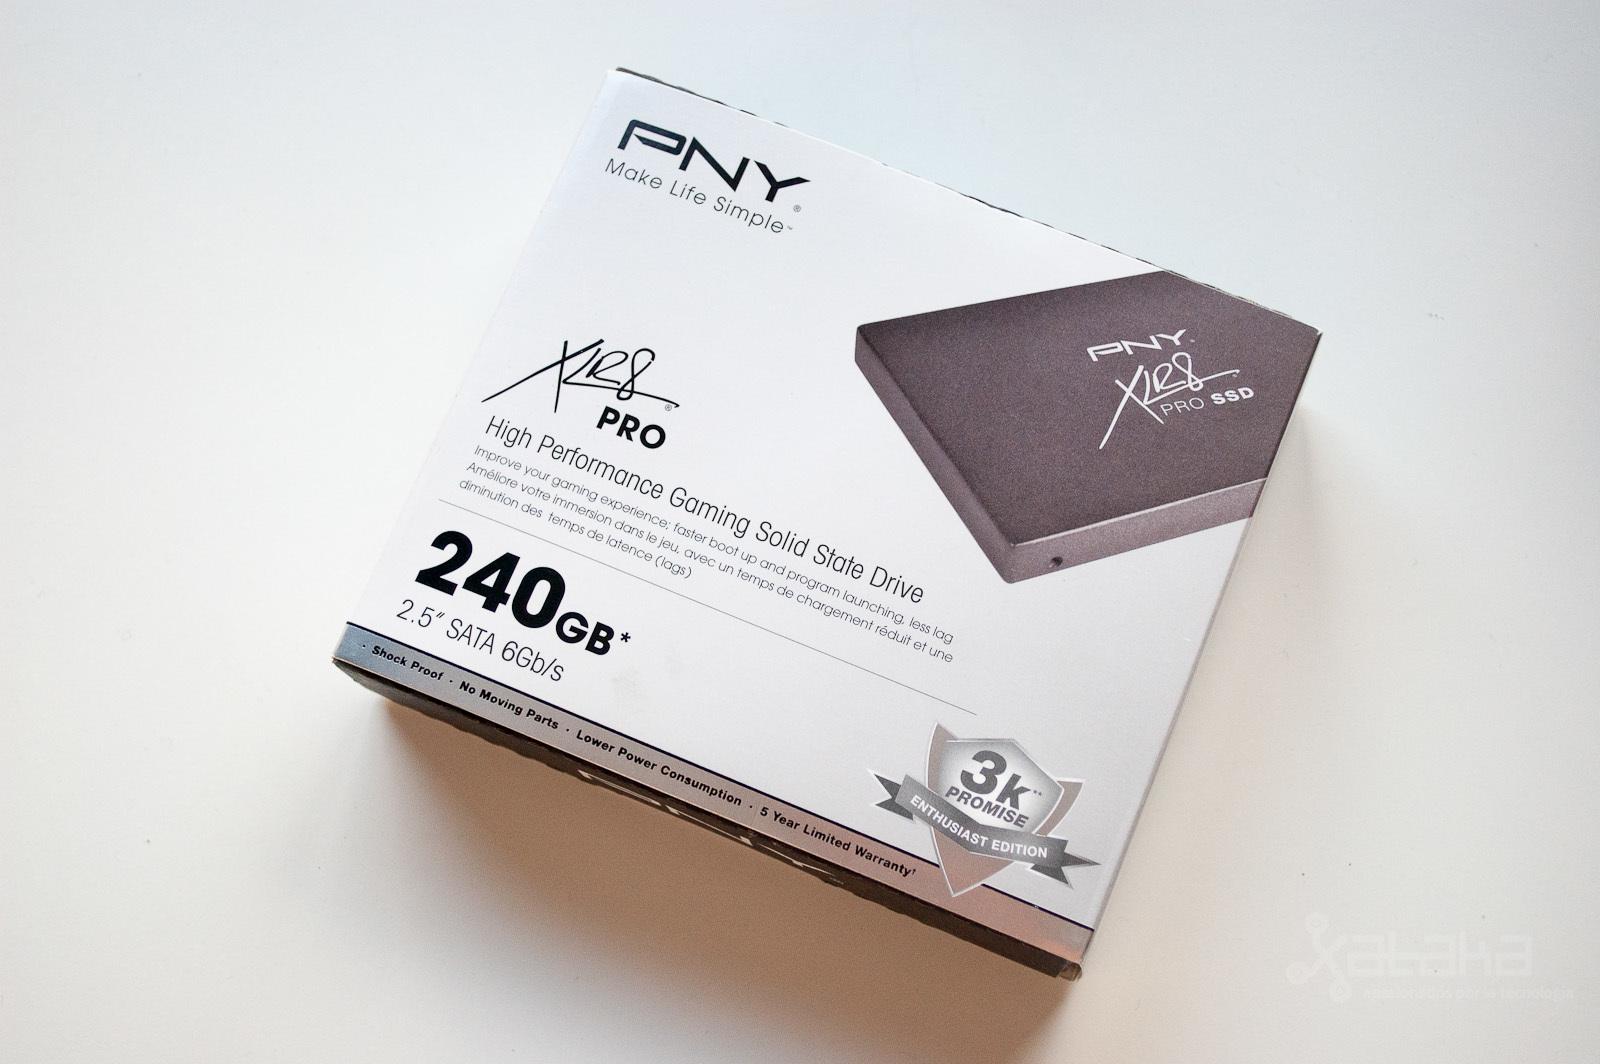 Foto de PNY XLR8 Pro SSD, análisis (1/11)